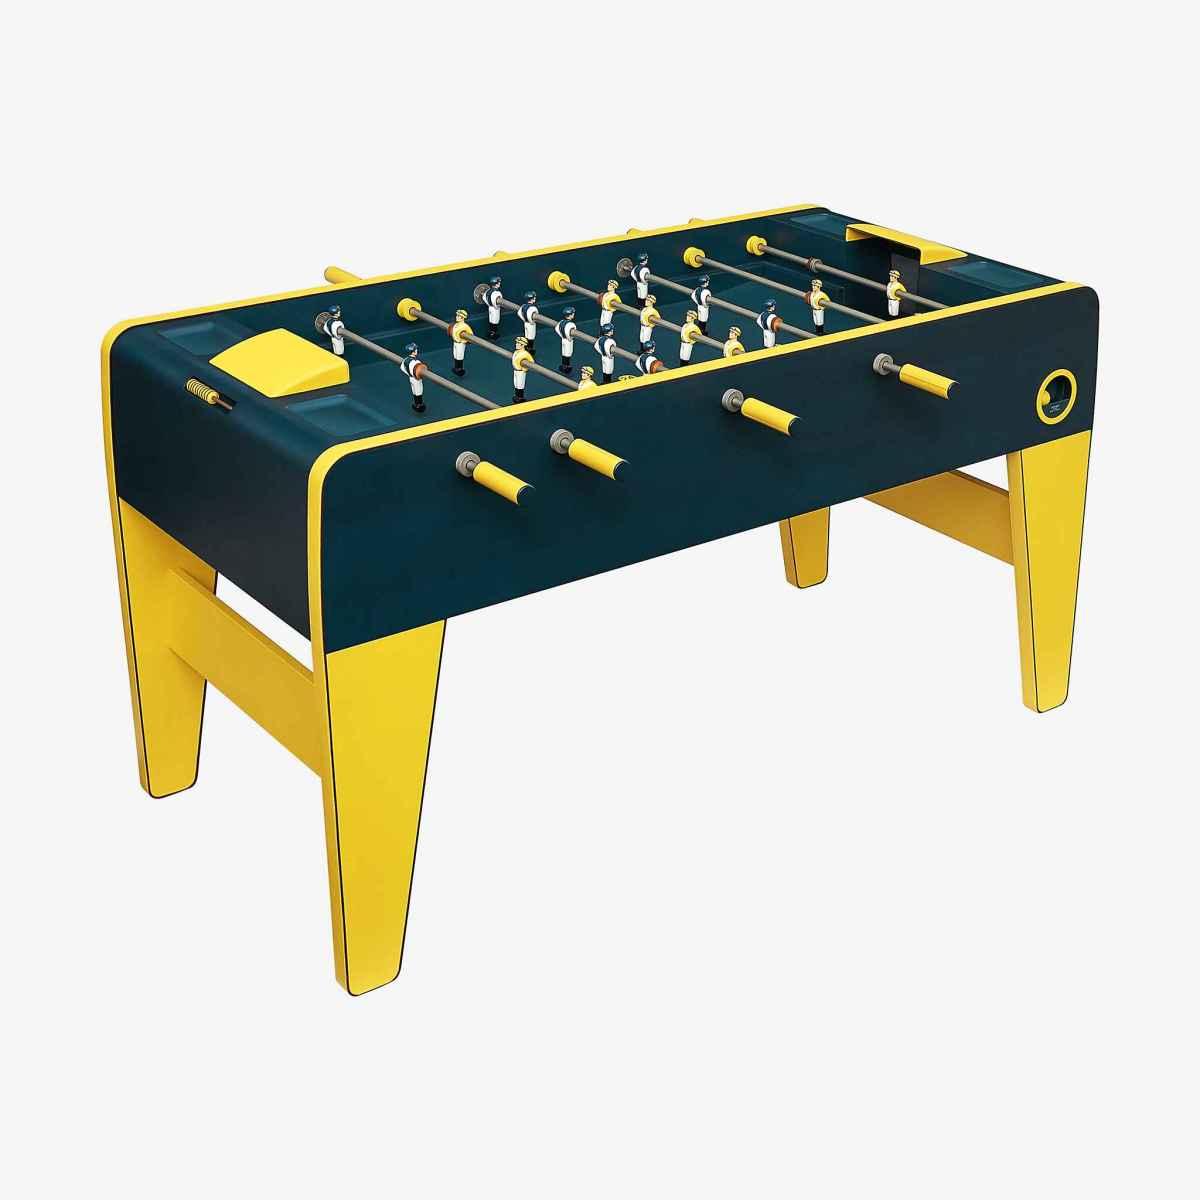 Hermes Also Makes Foosball Tables Fake Alligator - Hermes coffee table